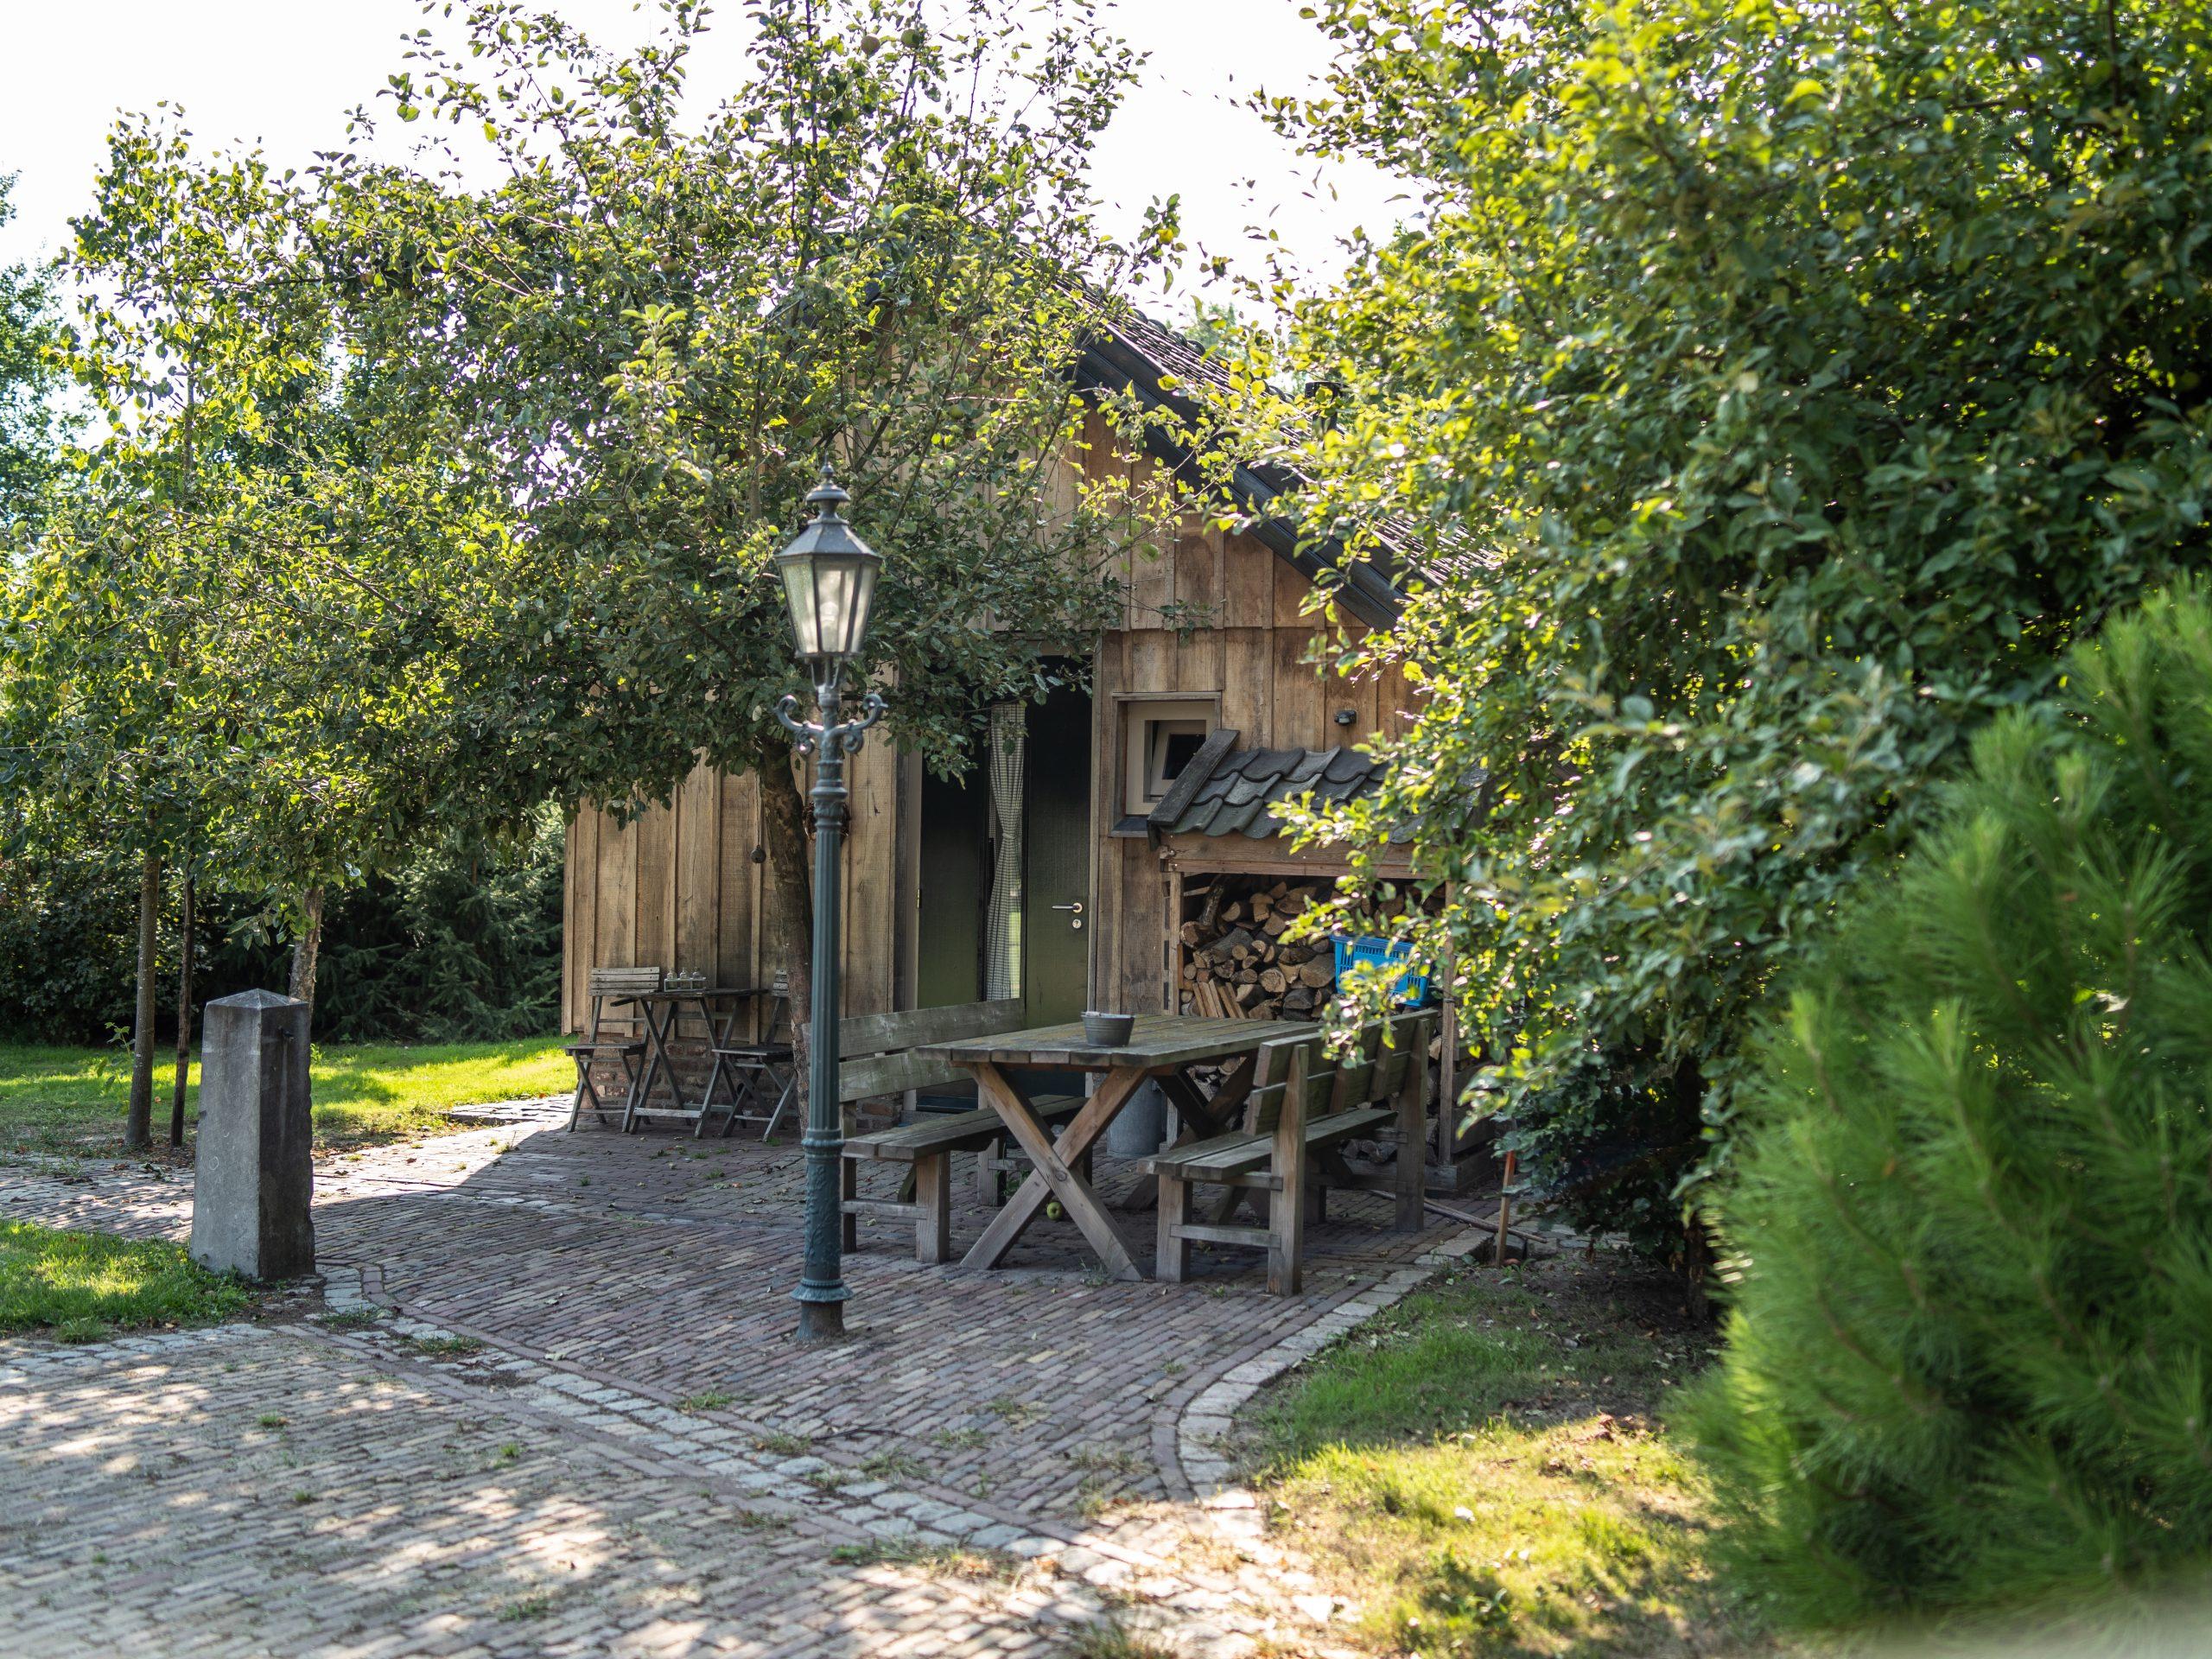 Tiny house De Rooij Ackers